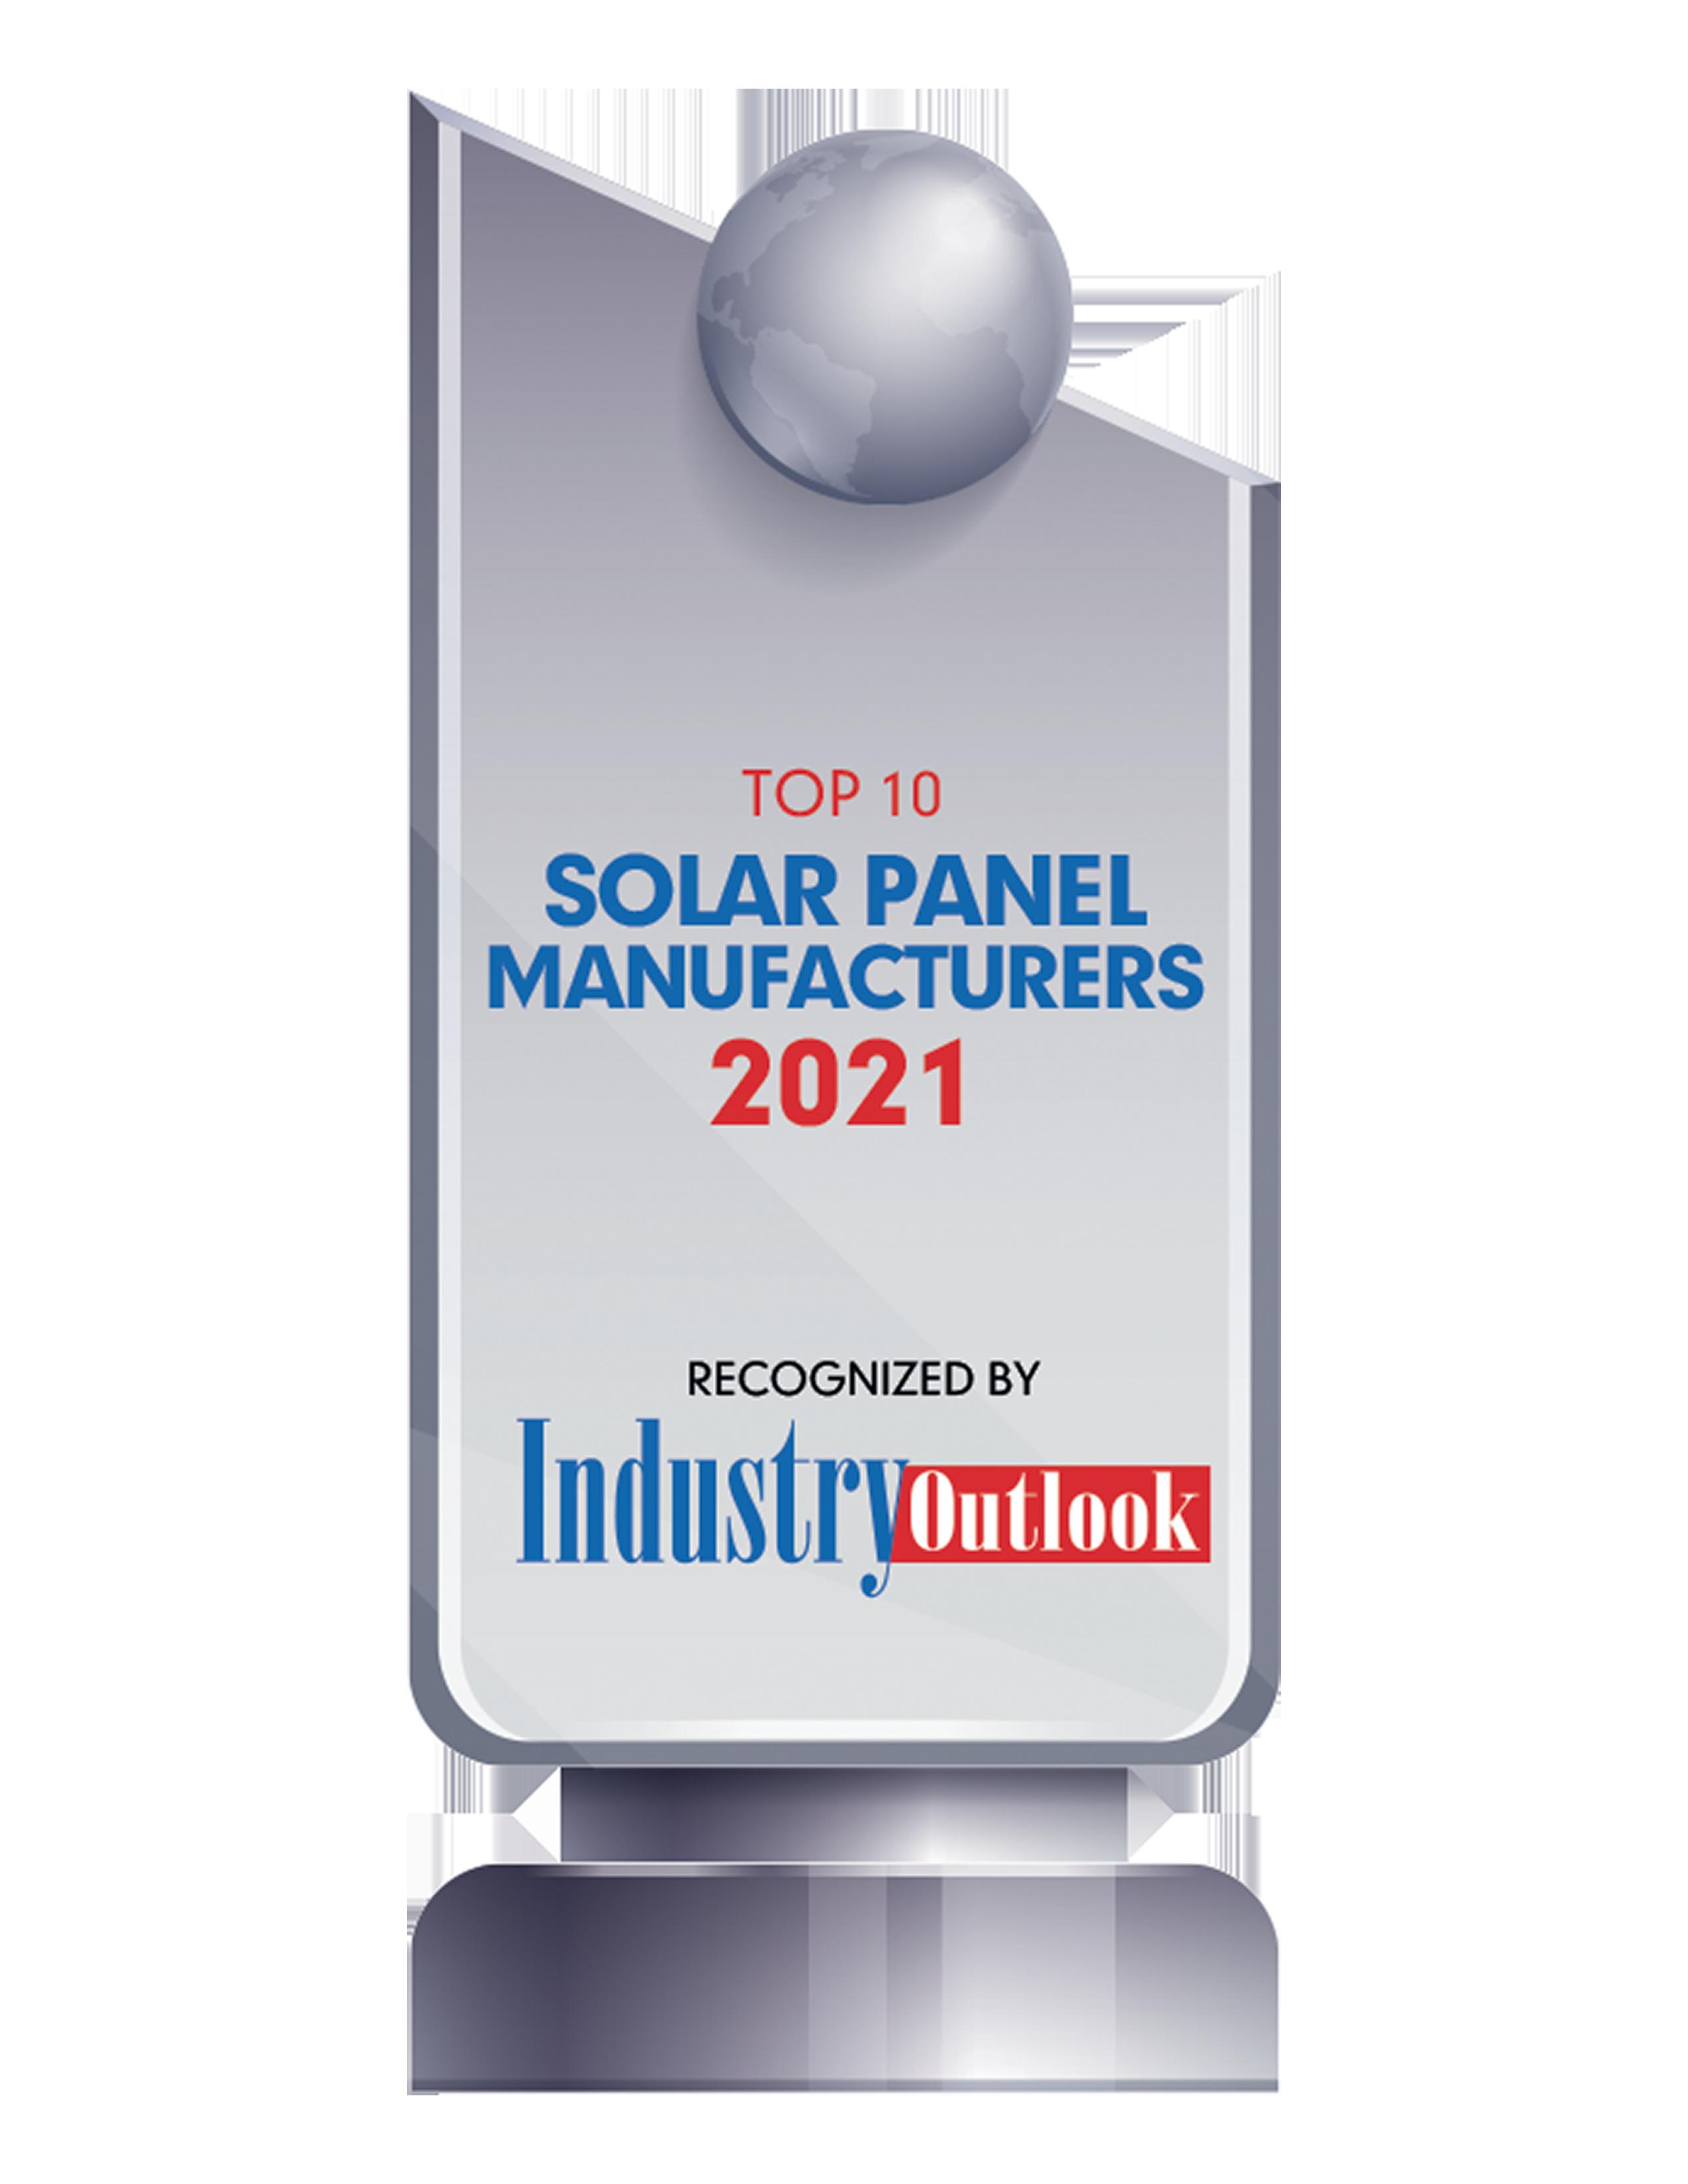 Top 10 Solar Panel Manufacturers 2021